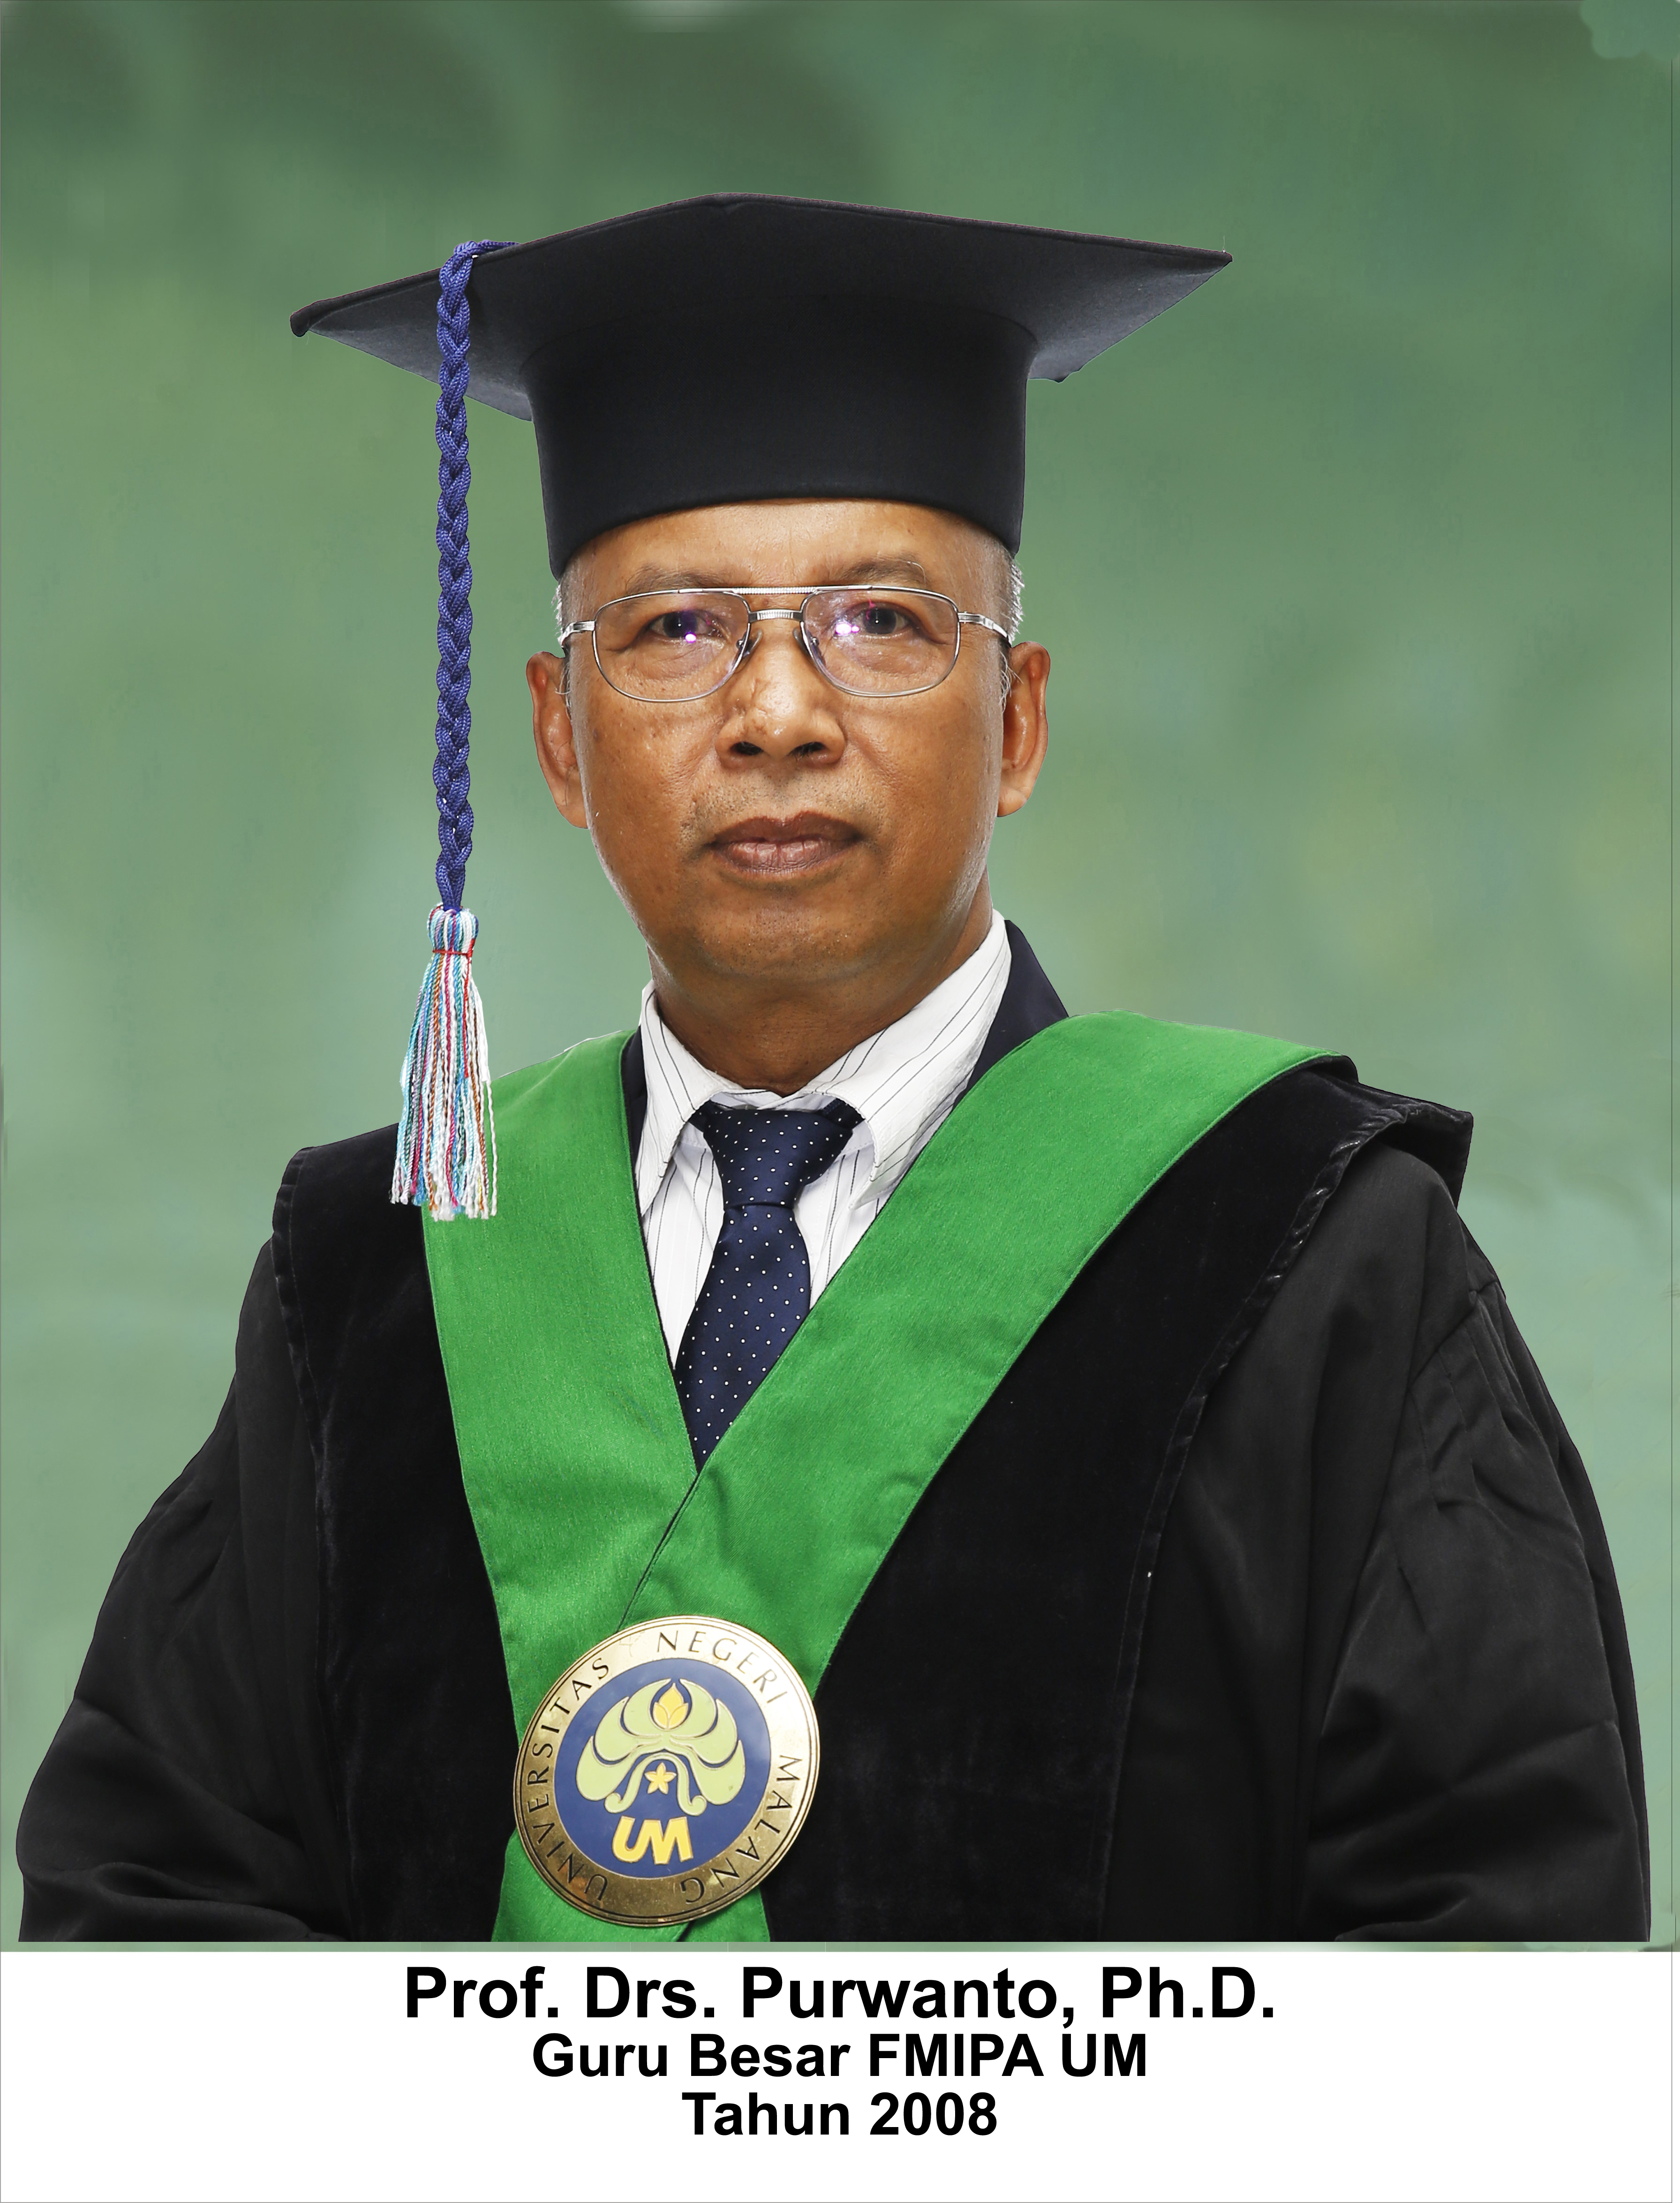 Prof. Drs. Purwanto, PhD